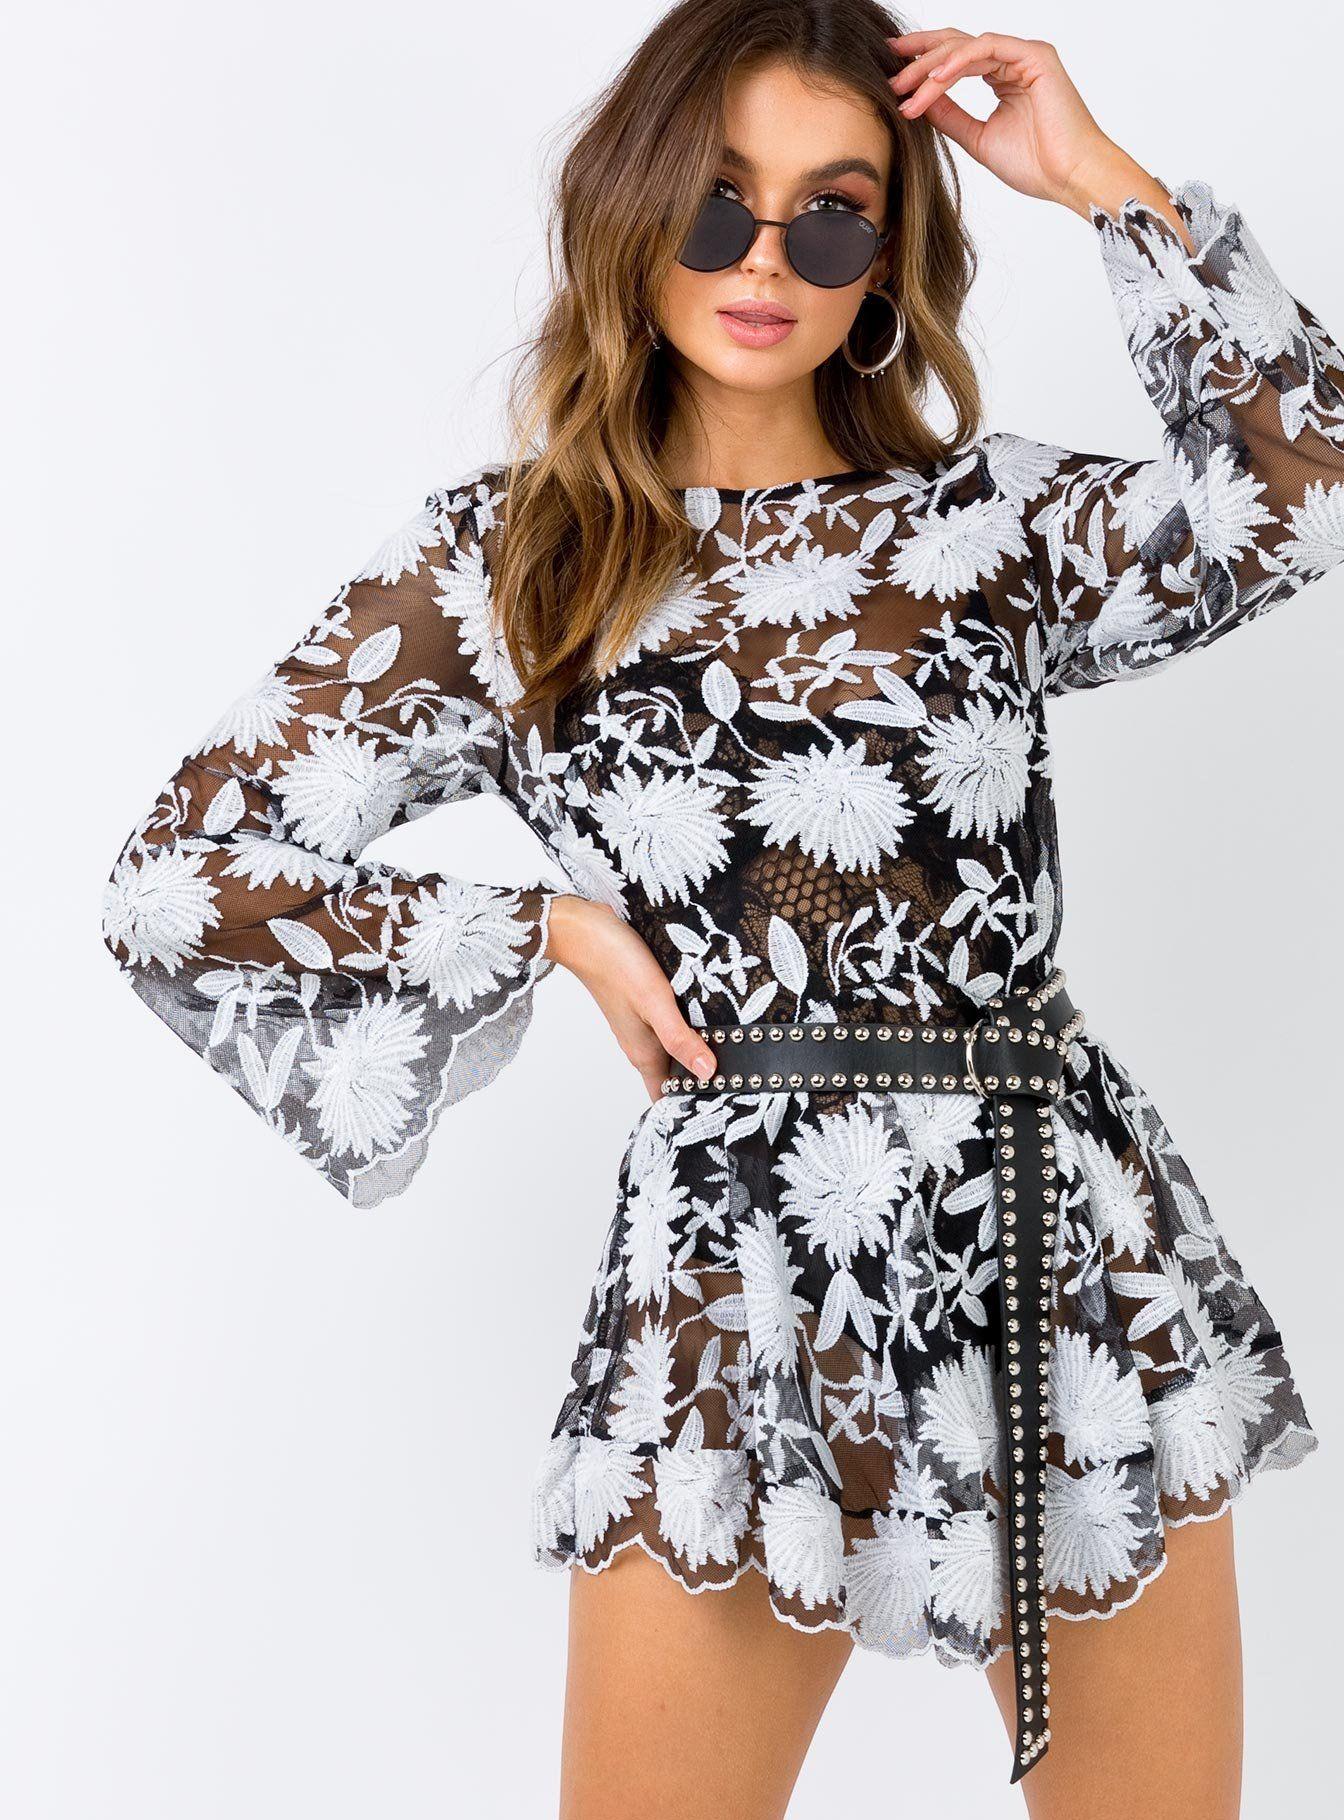 Indigo Skies Lace Mini Dress Black Black/White US 0